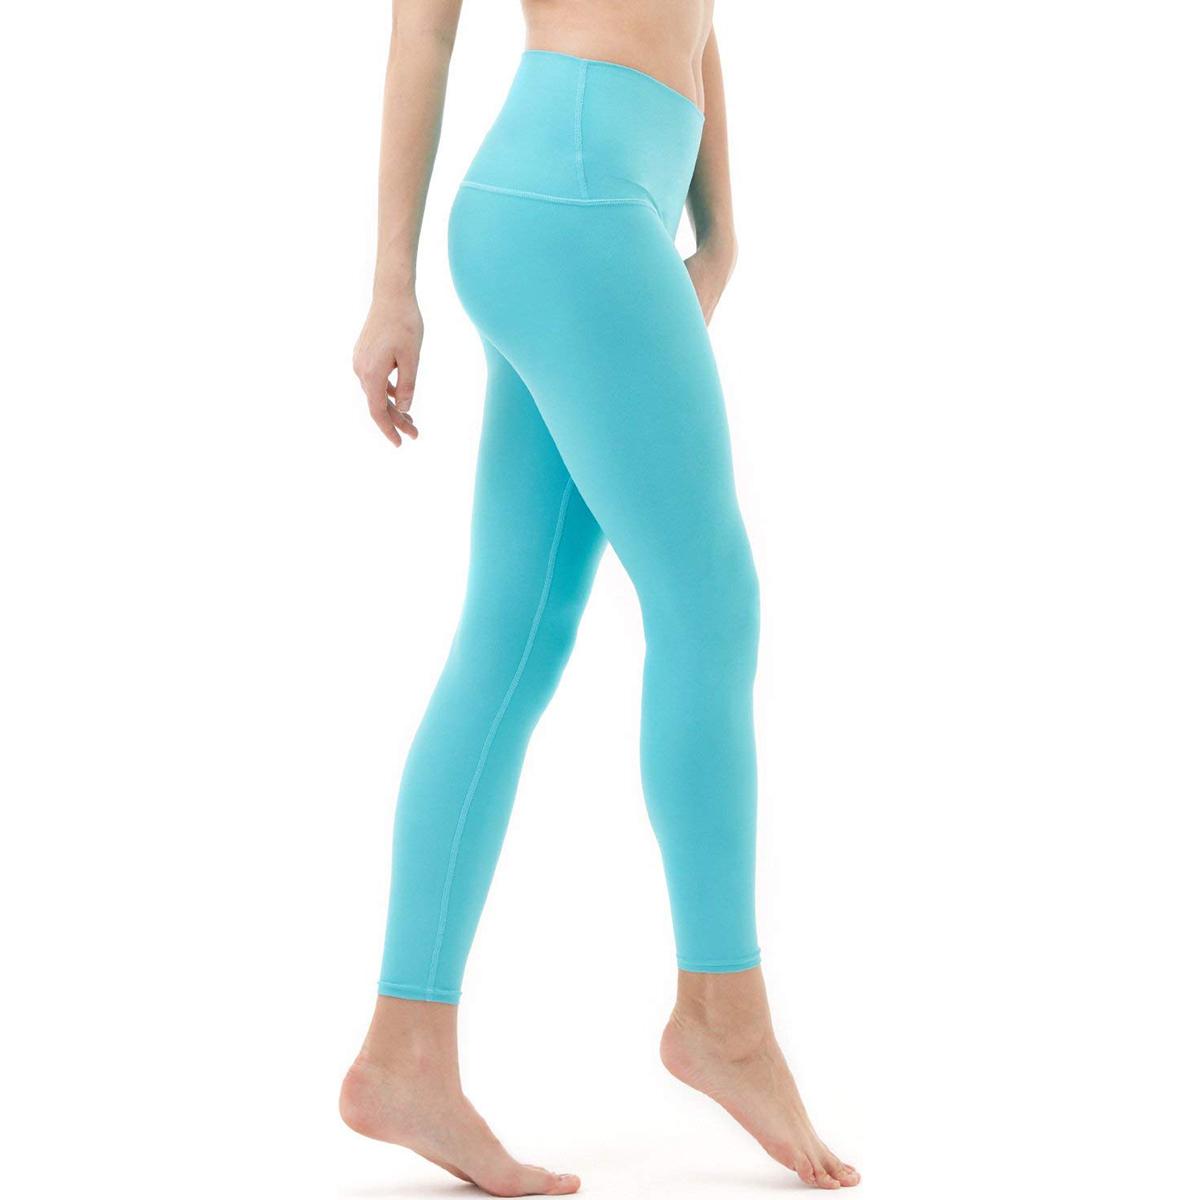 thumbnail 13 - TSLA Tesla FYP52 Women's High-Waisted Ultra-Stretch Tummy Control Yoga Pants